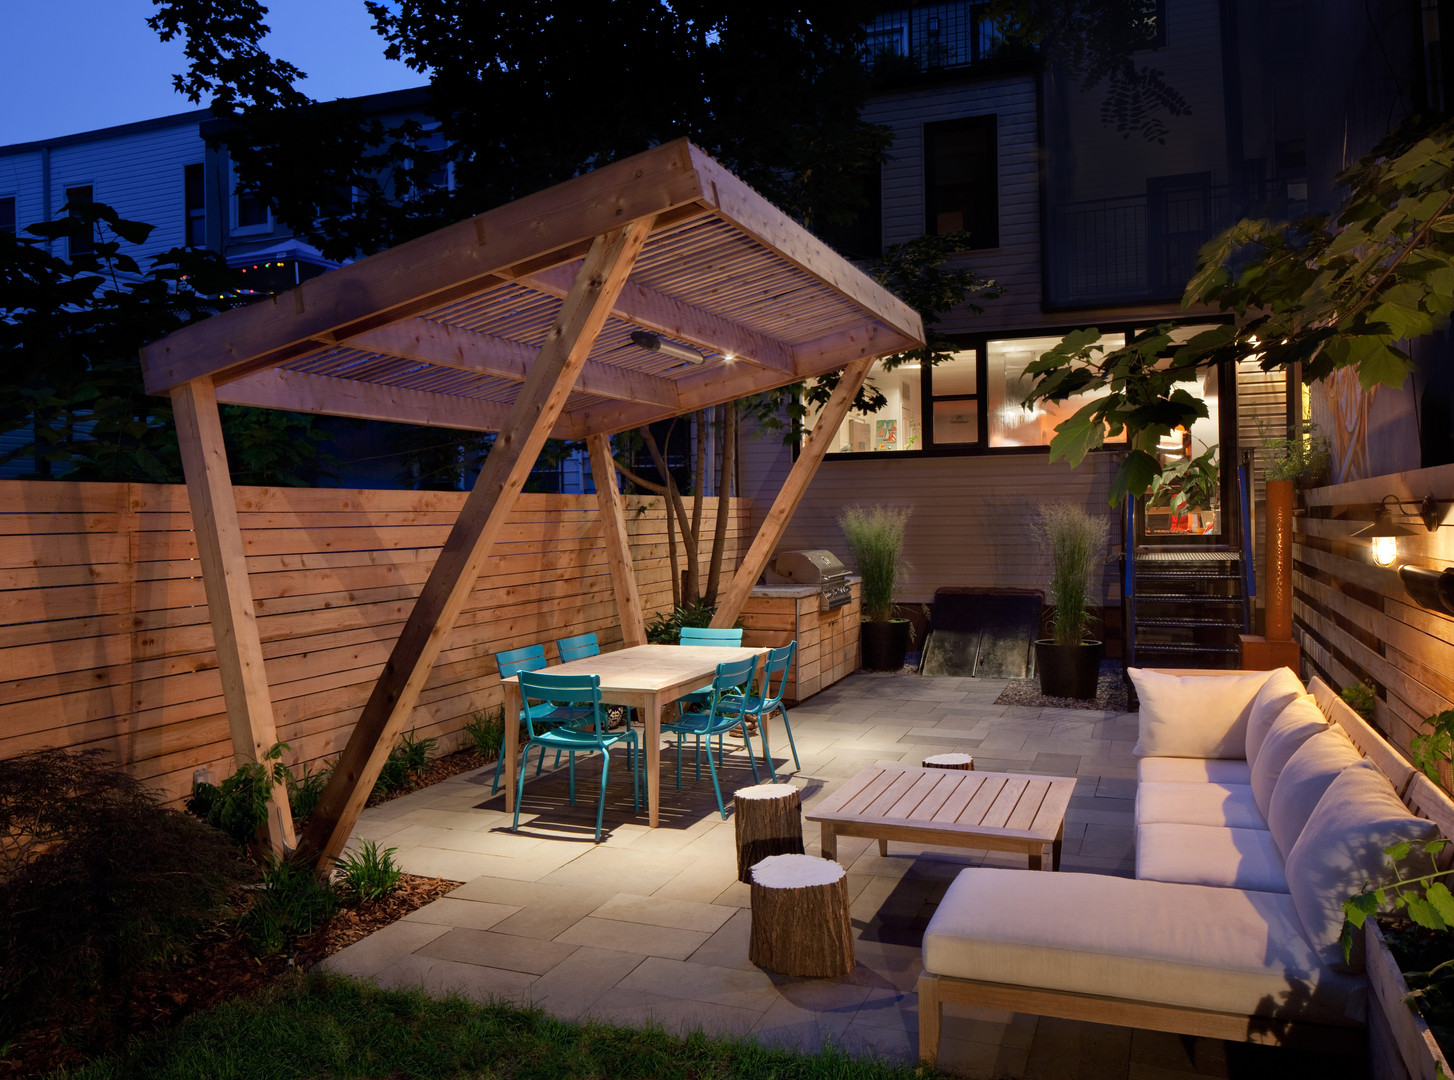 San Francisco_backyard_patio_design.jpg